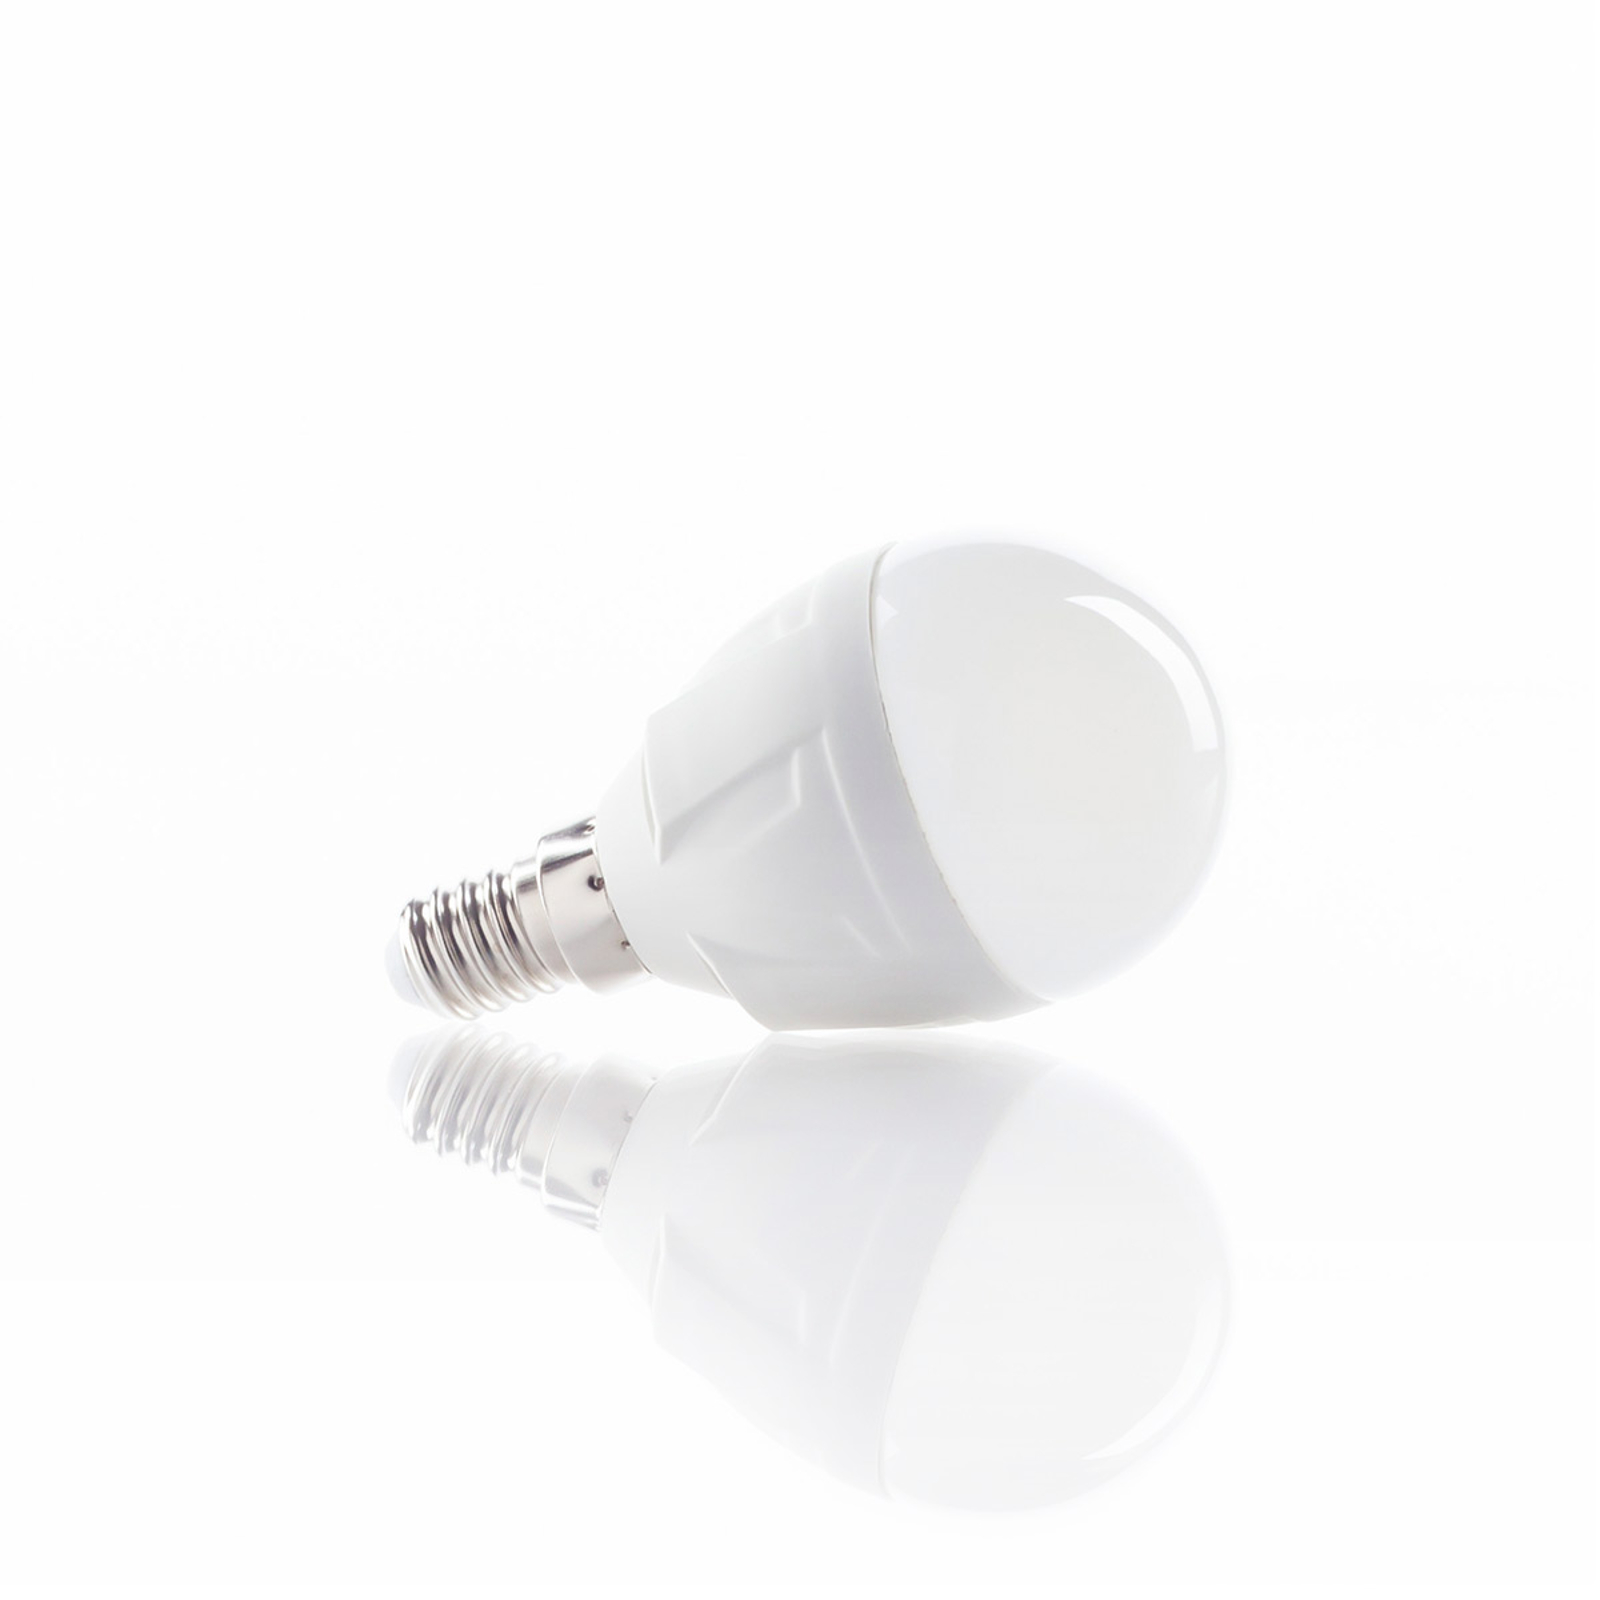 E14 6W 830 LED-pære med dråbeform, varmhvid